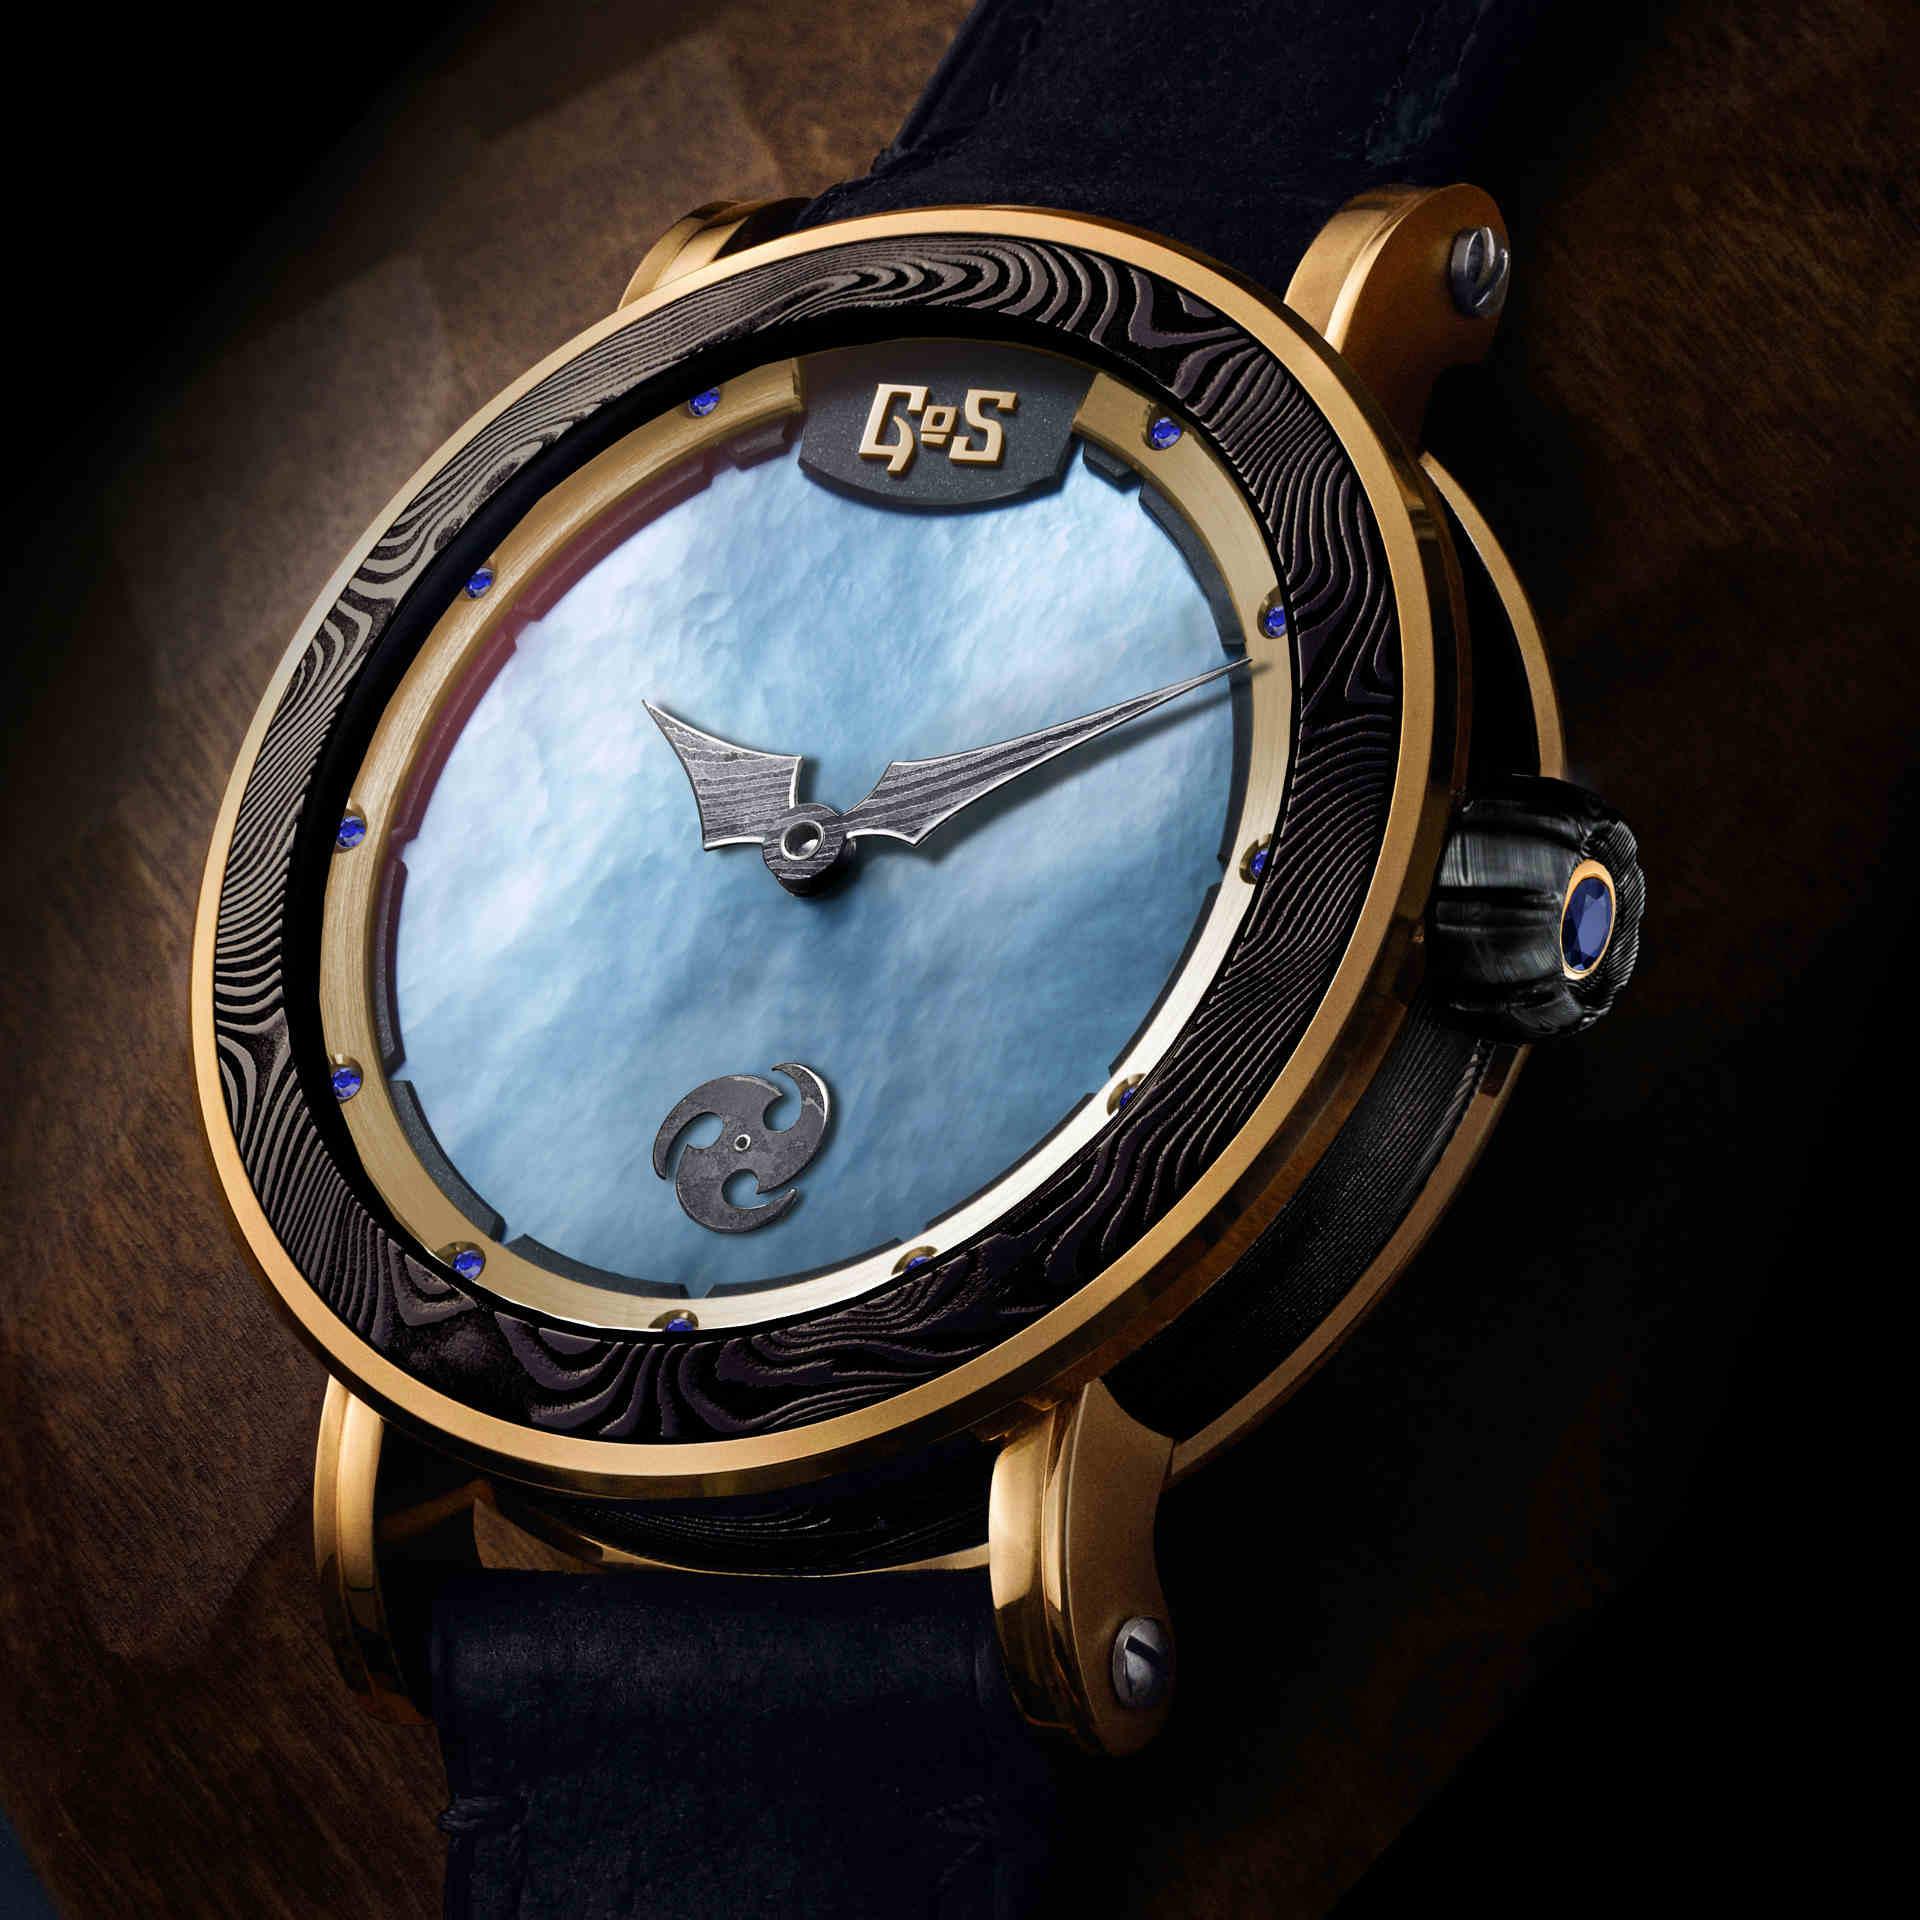 Skadi damascus steel watch by GoS